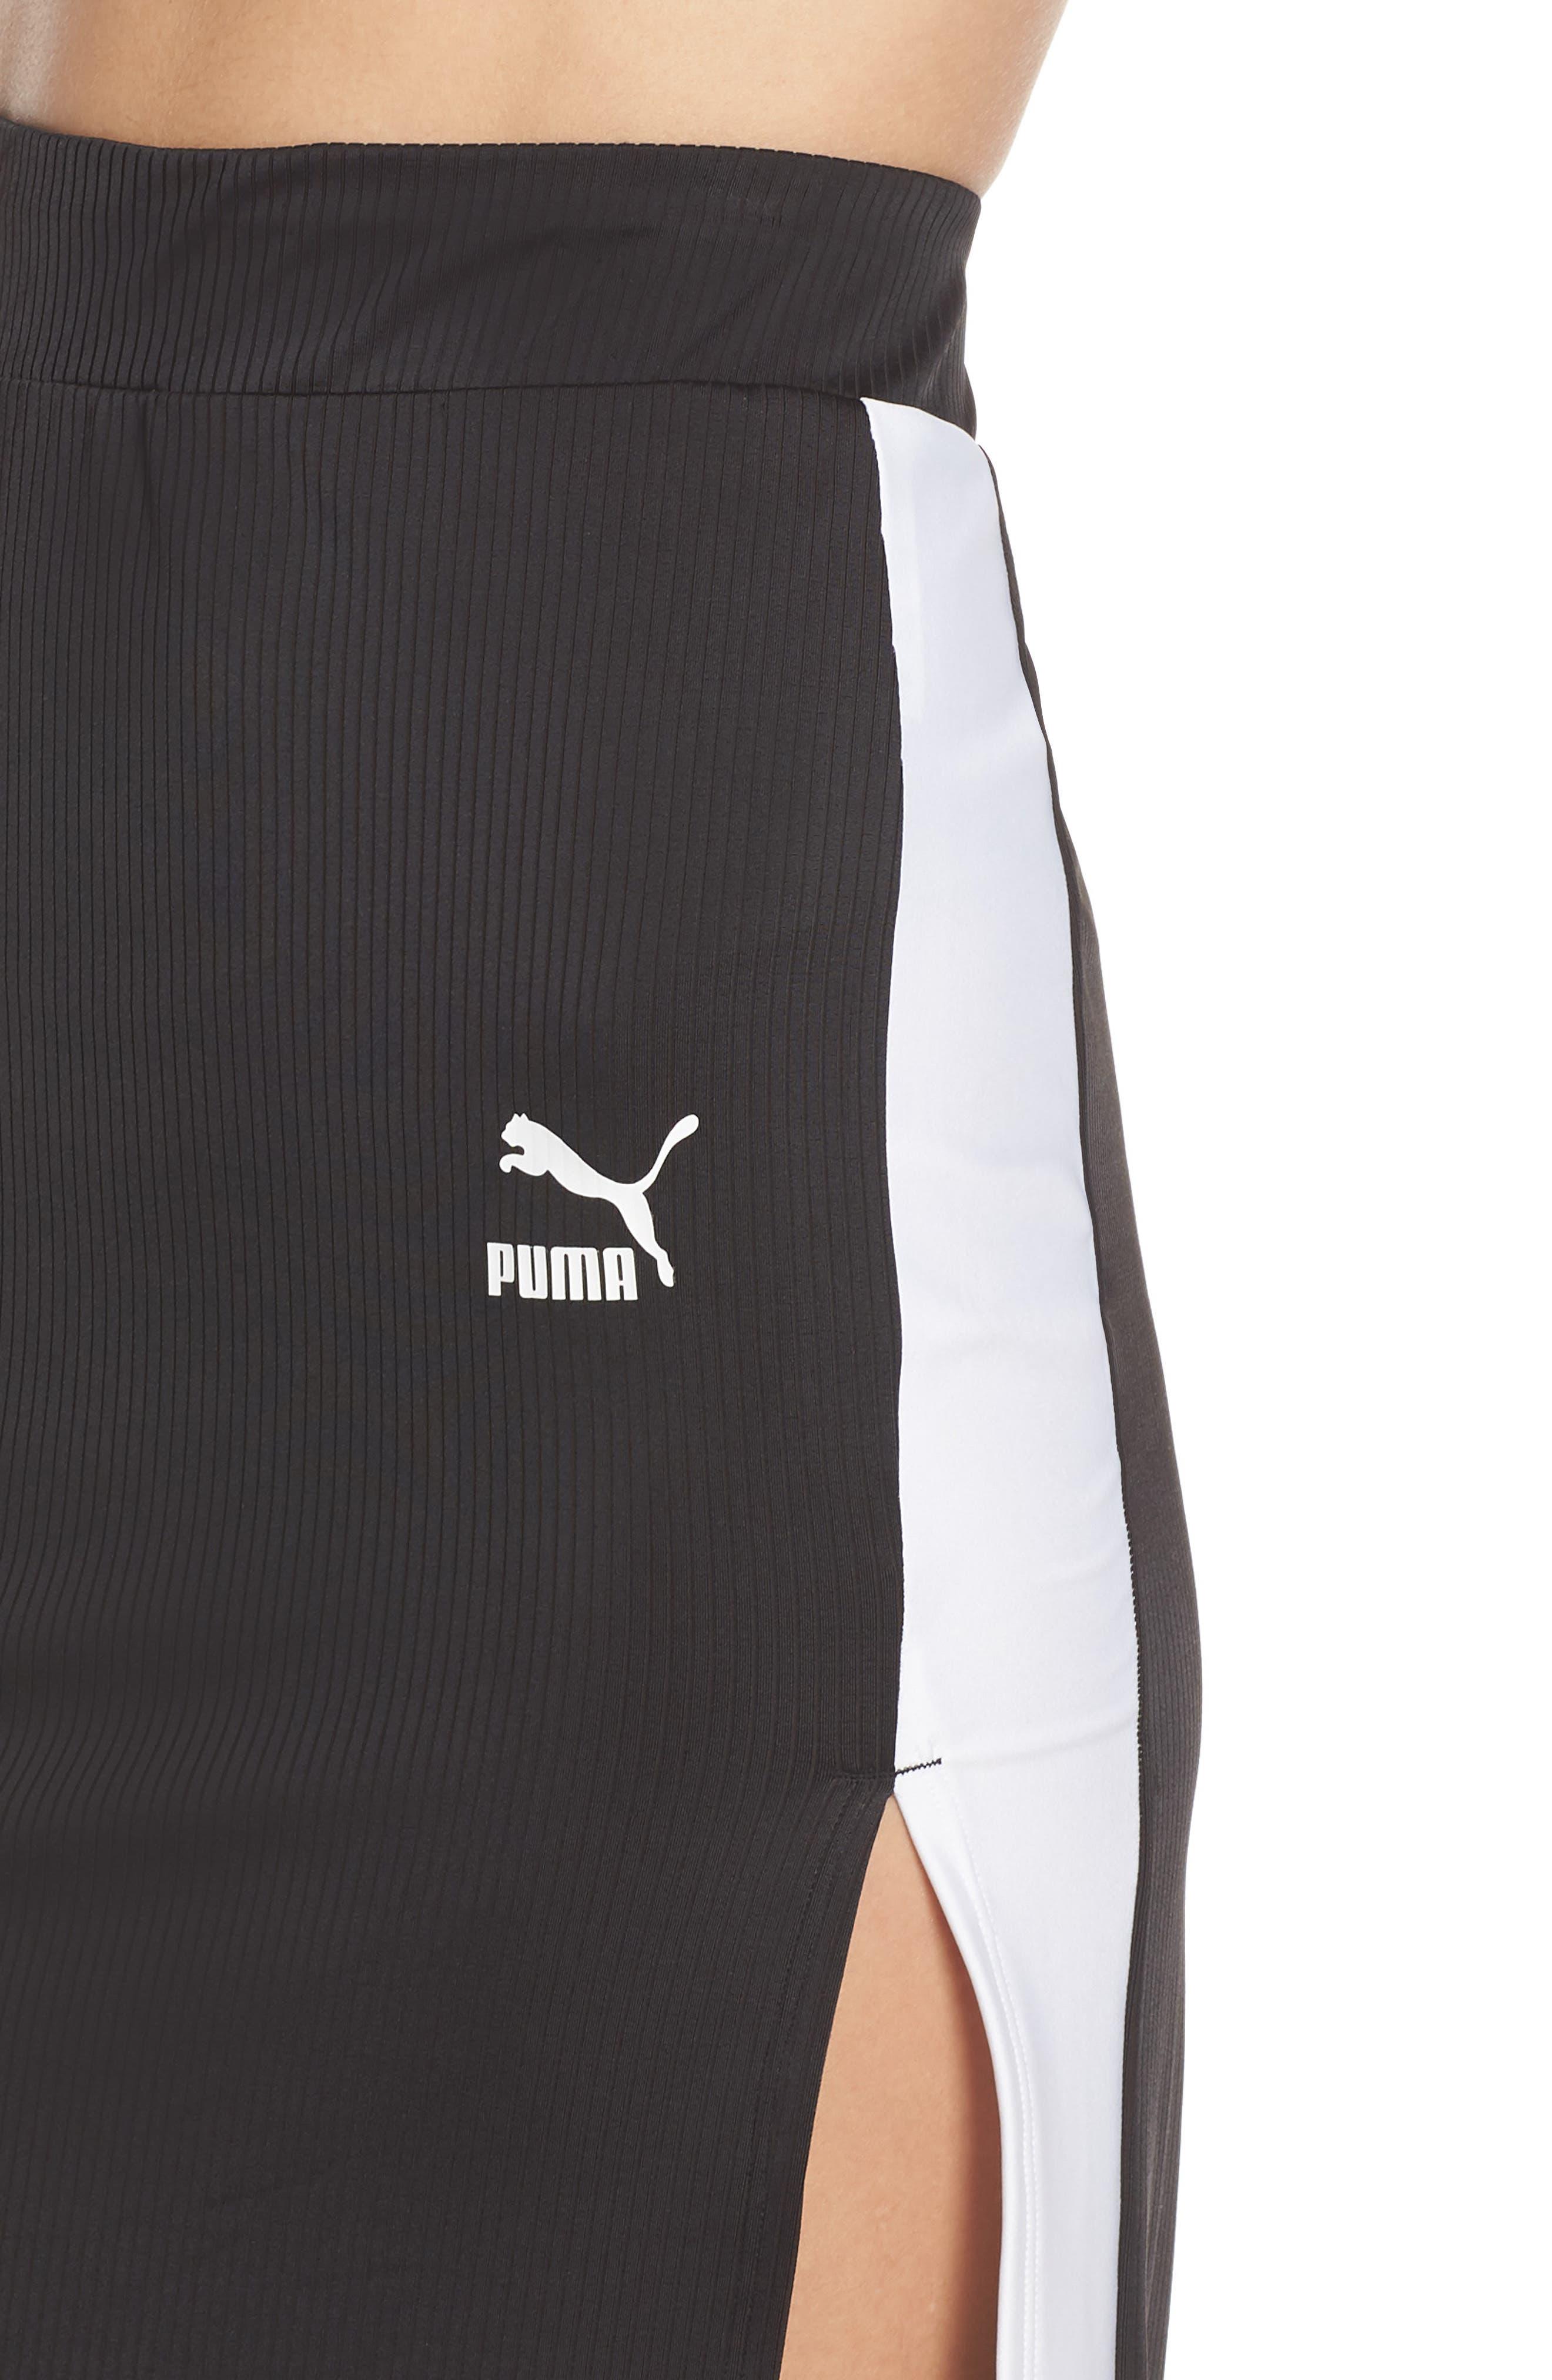 PUMA,                             Classics Ribbed Skirt,                             Alternate thumbnail 5, color,                             PUMA BLACK